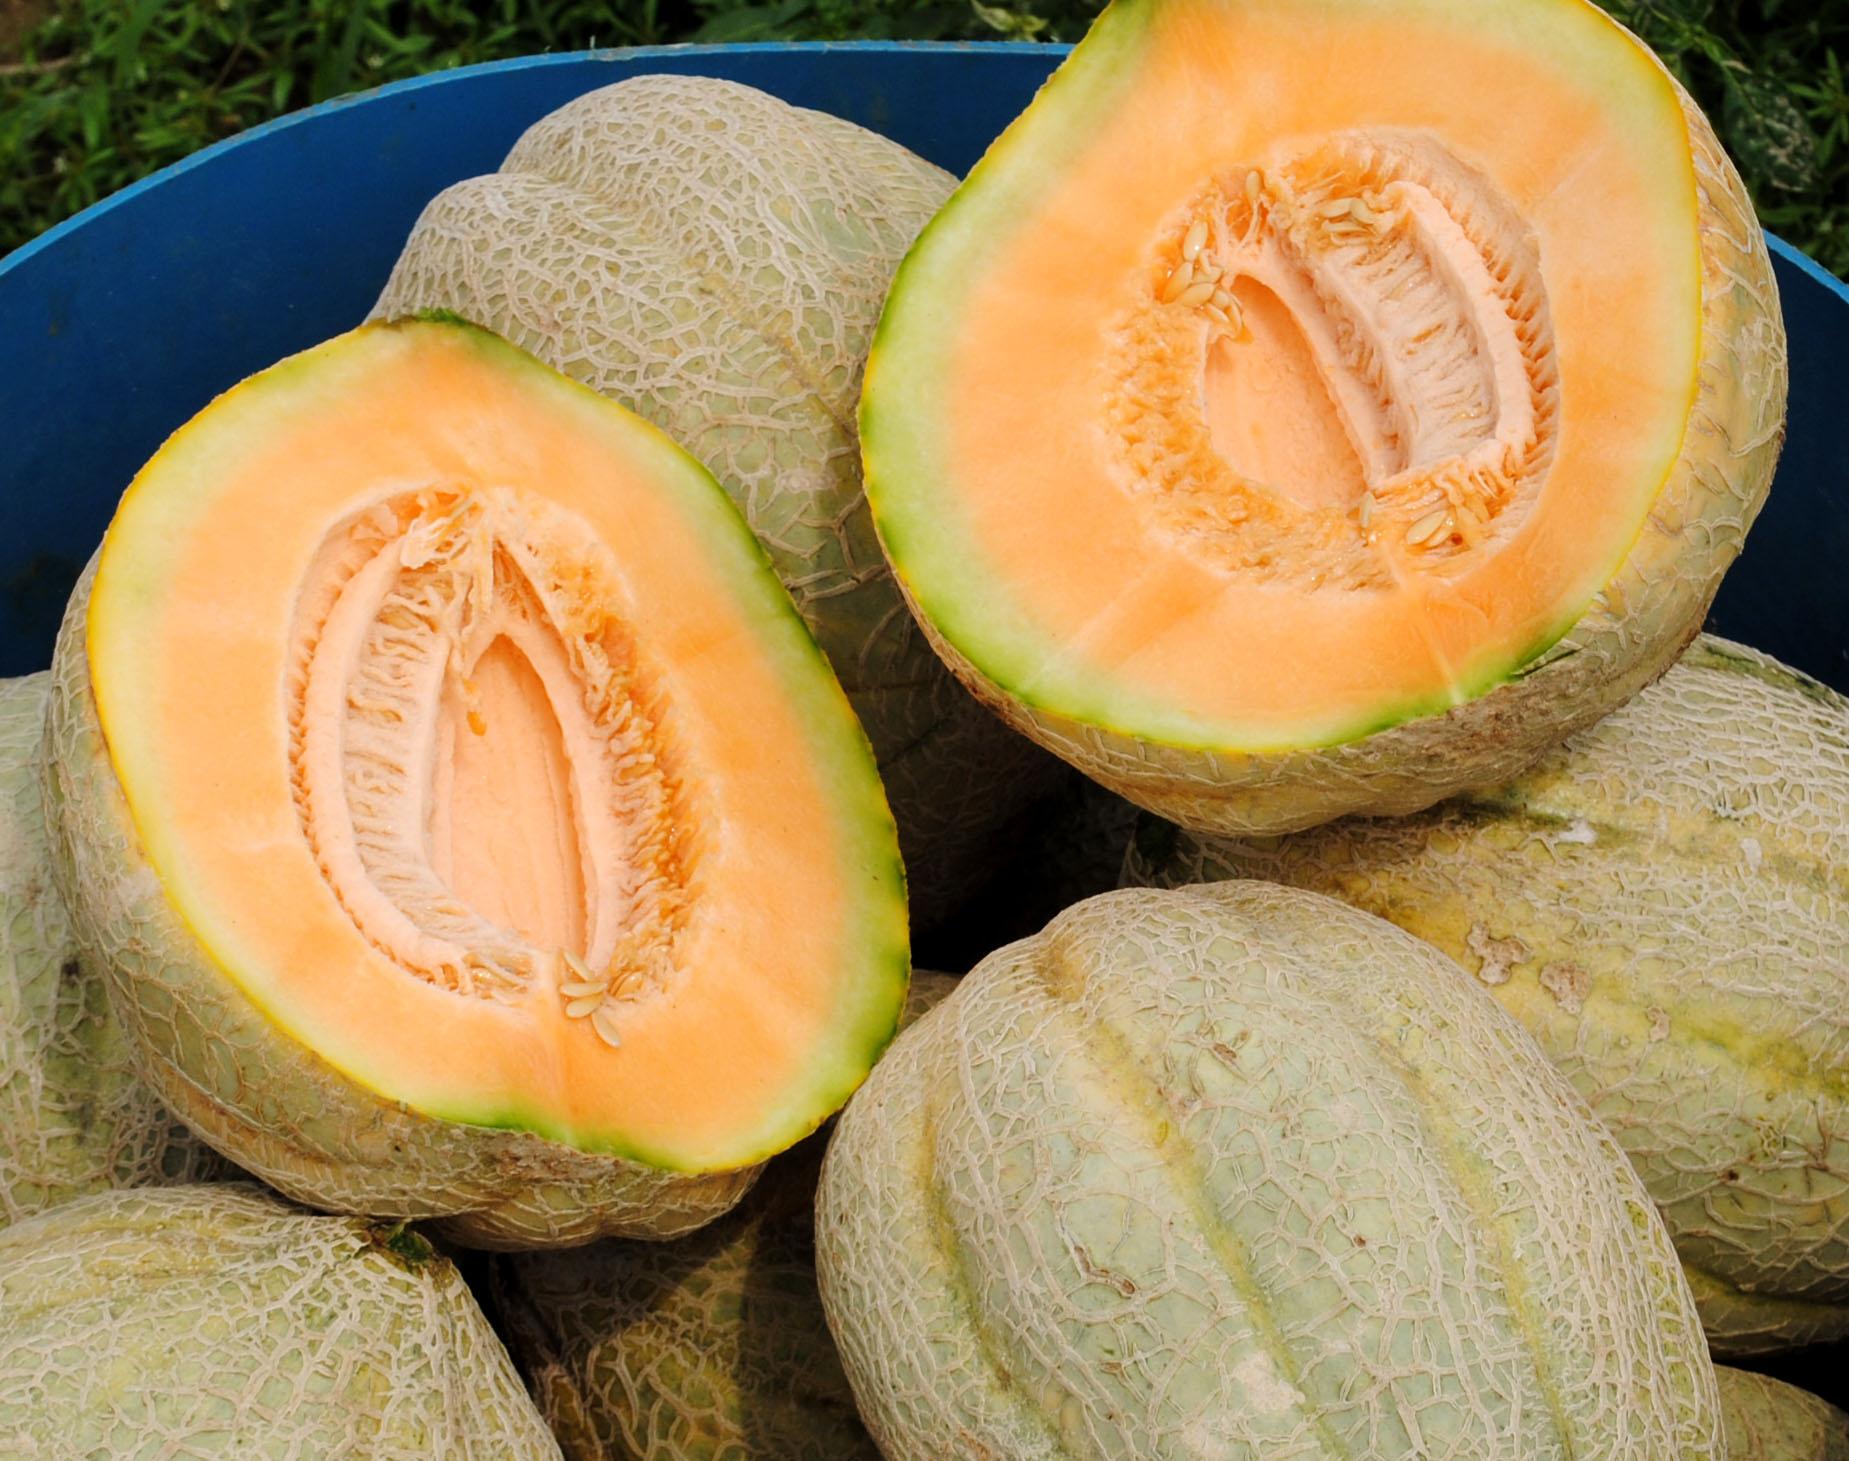 pike muskmelon 2 g southern exposure seed exchange saving the